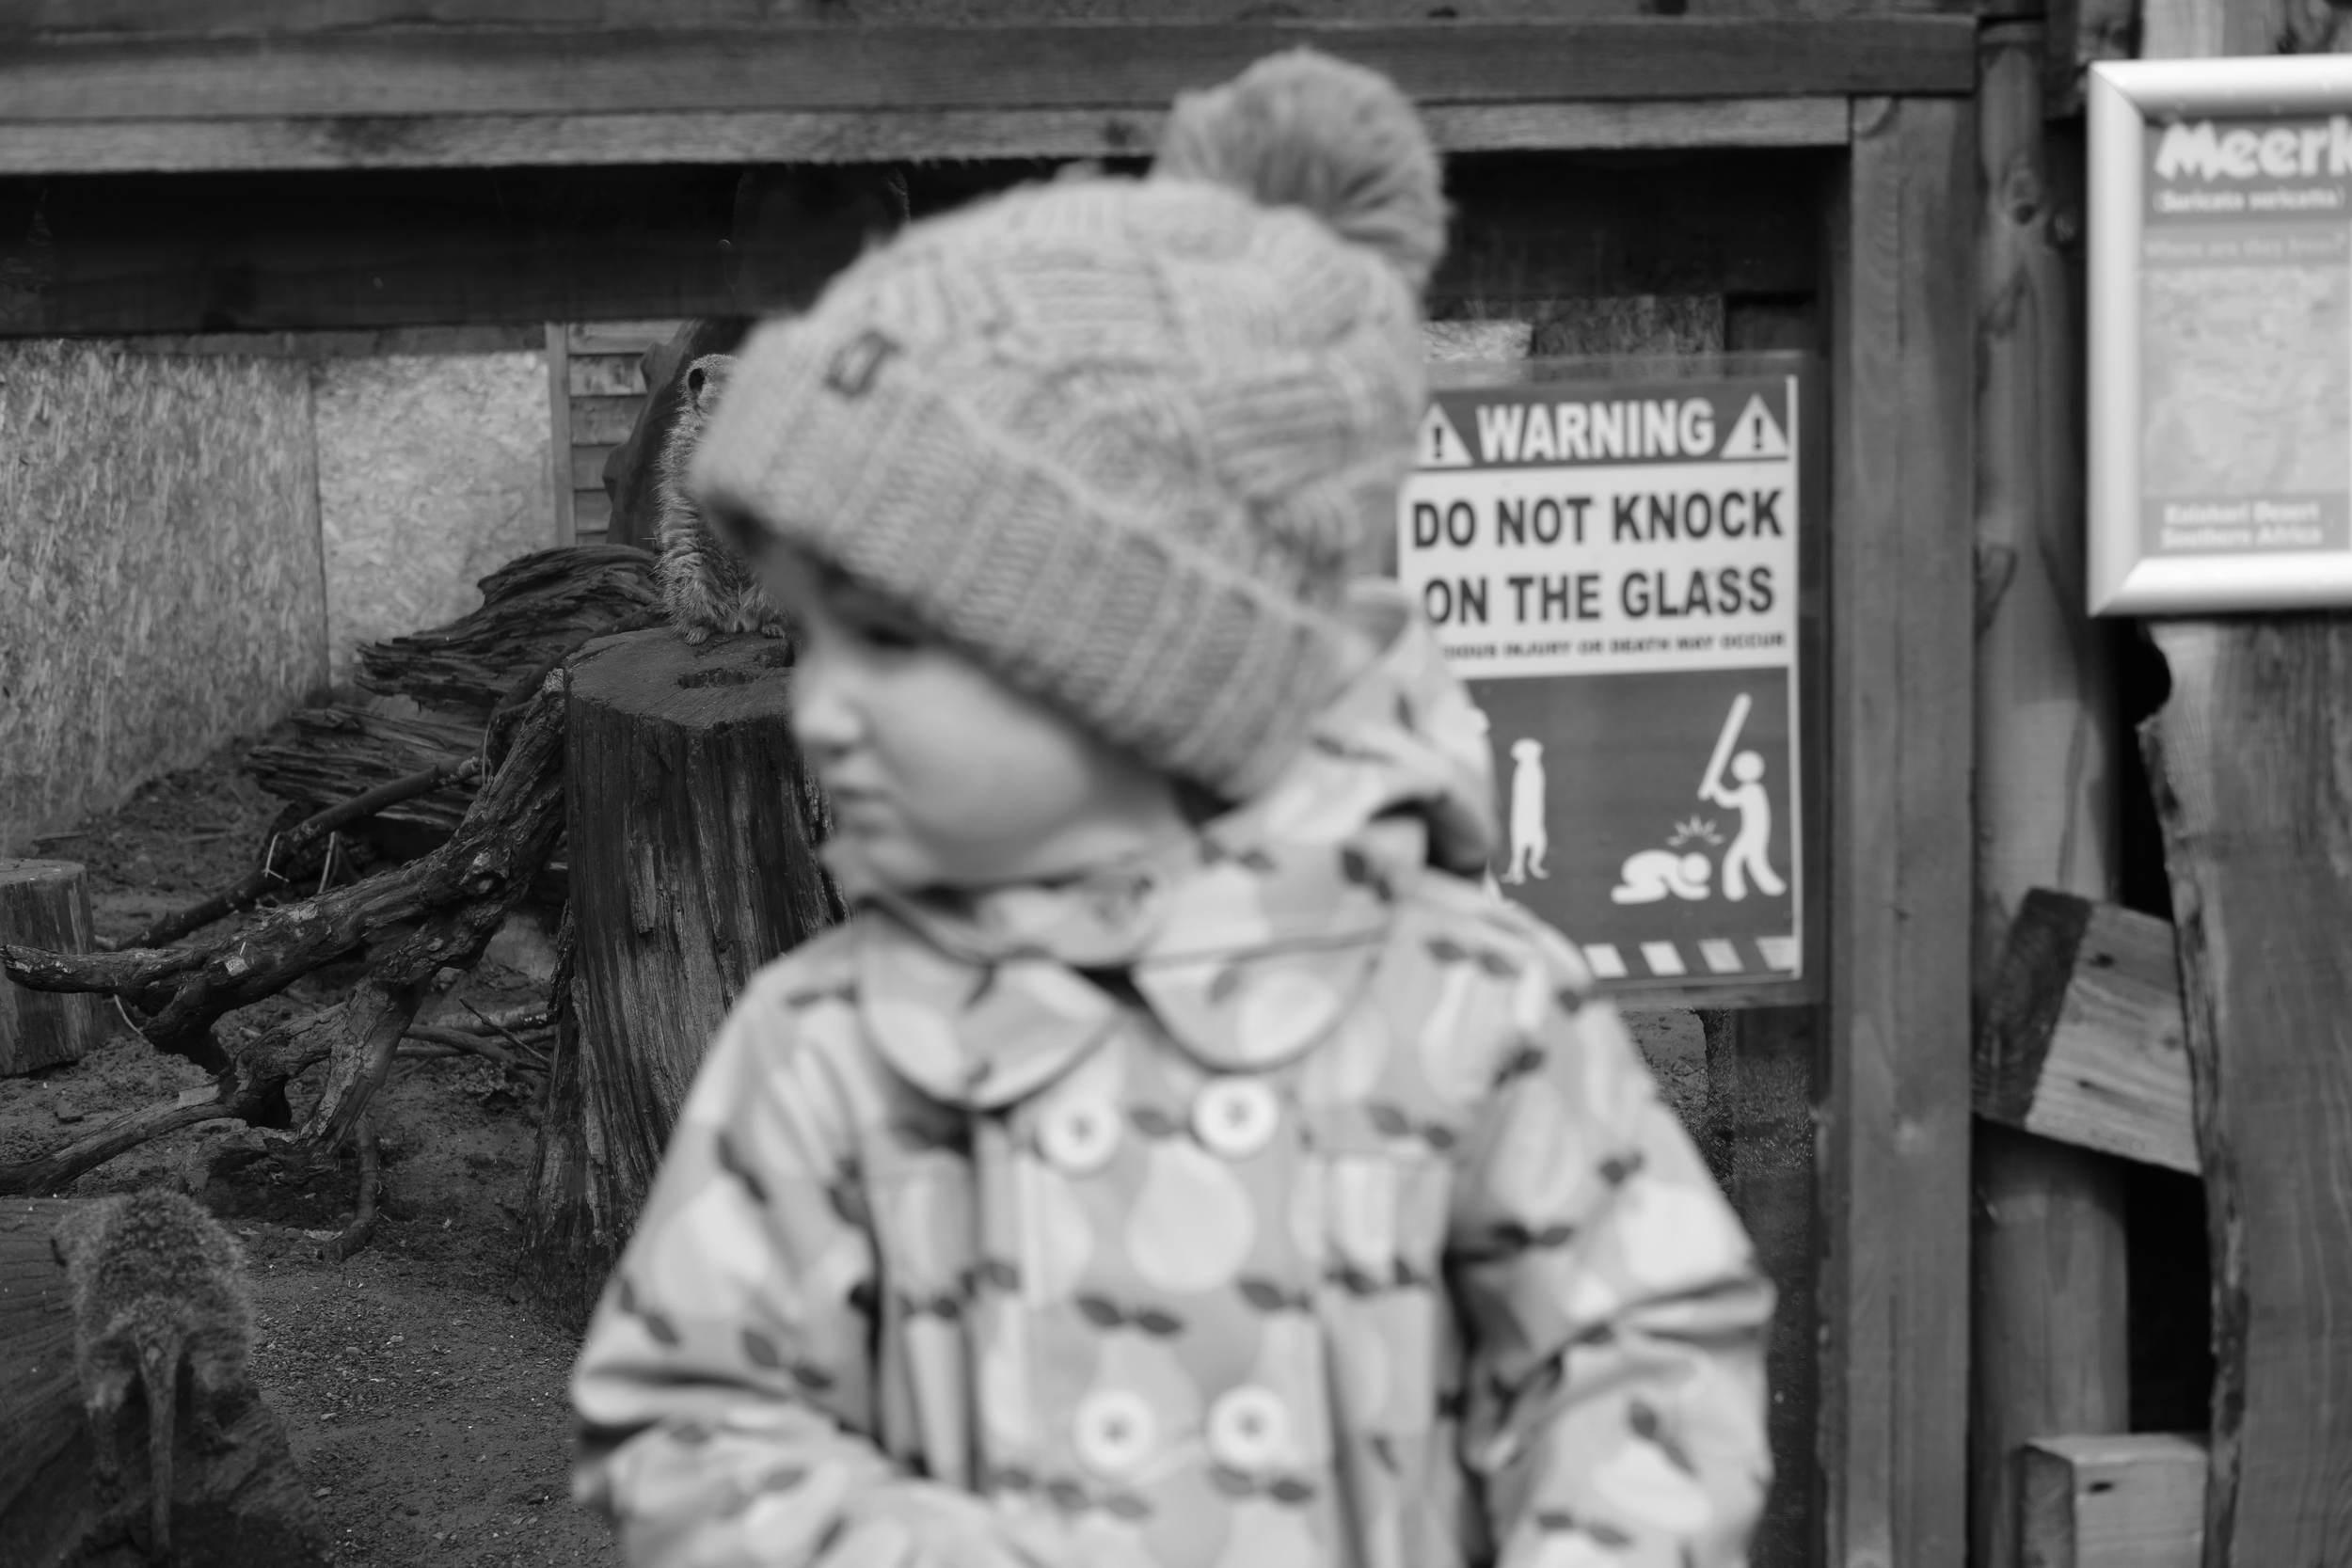 Audrey at Meerkat enclosure at Eshottheugh Animal Park, Northumberland